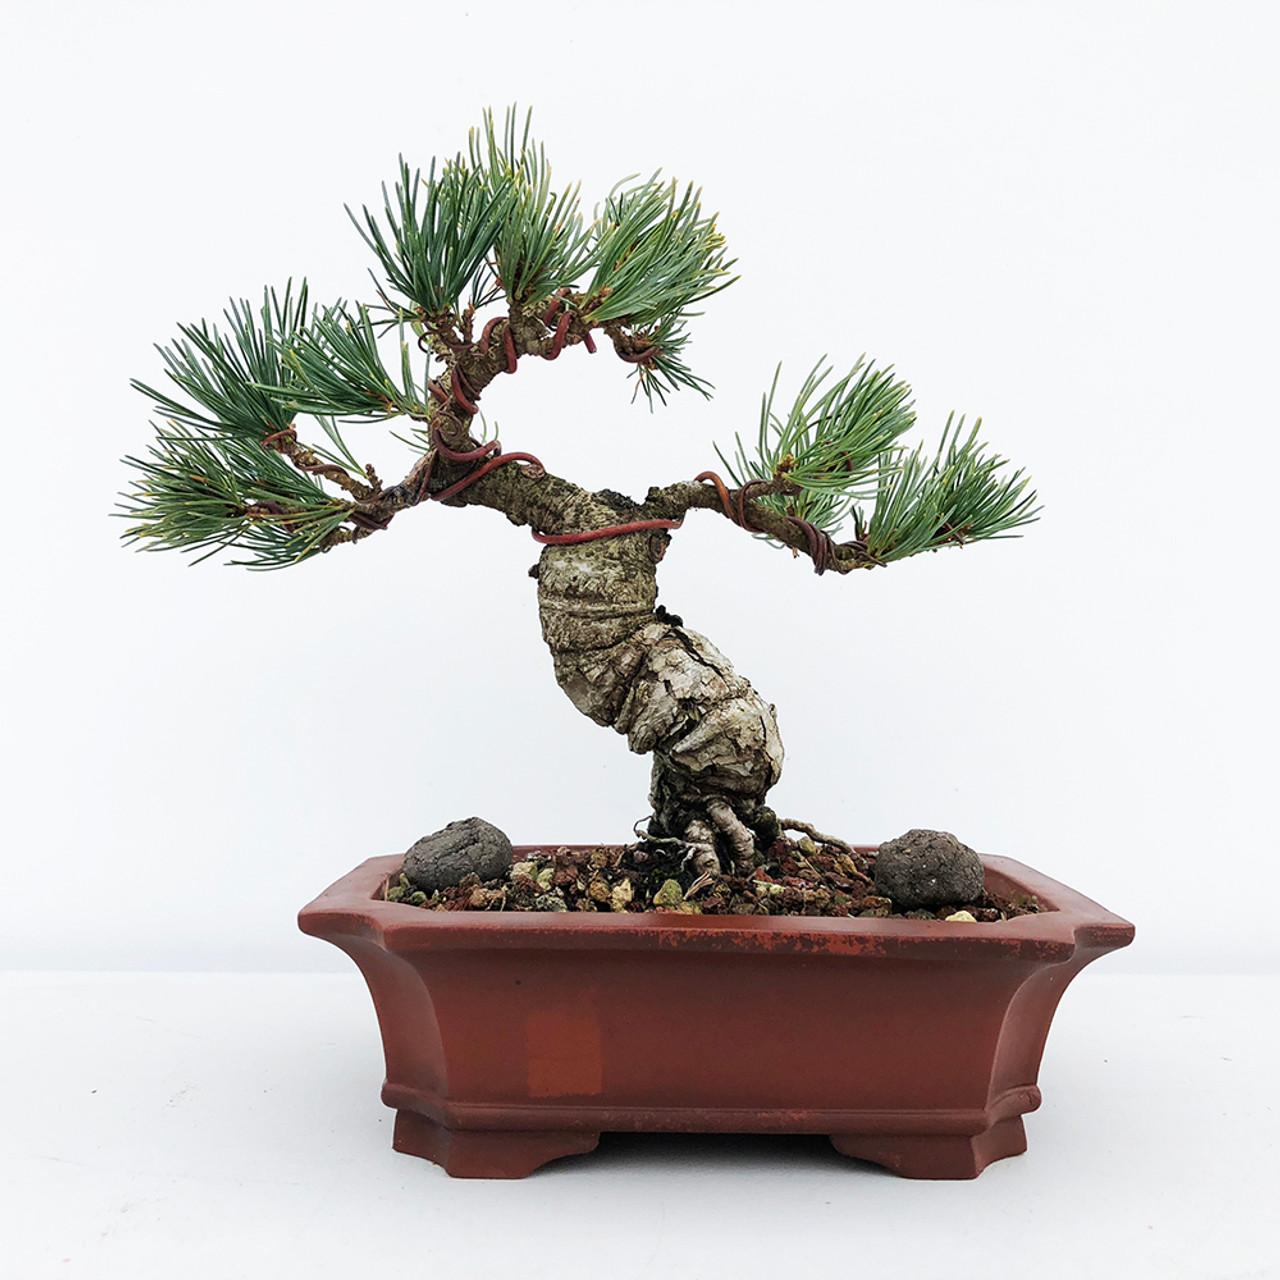 Japanese White Pine Bonsai Tree For Sale Bonsai Tree